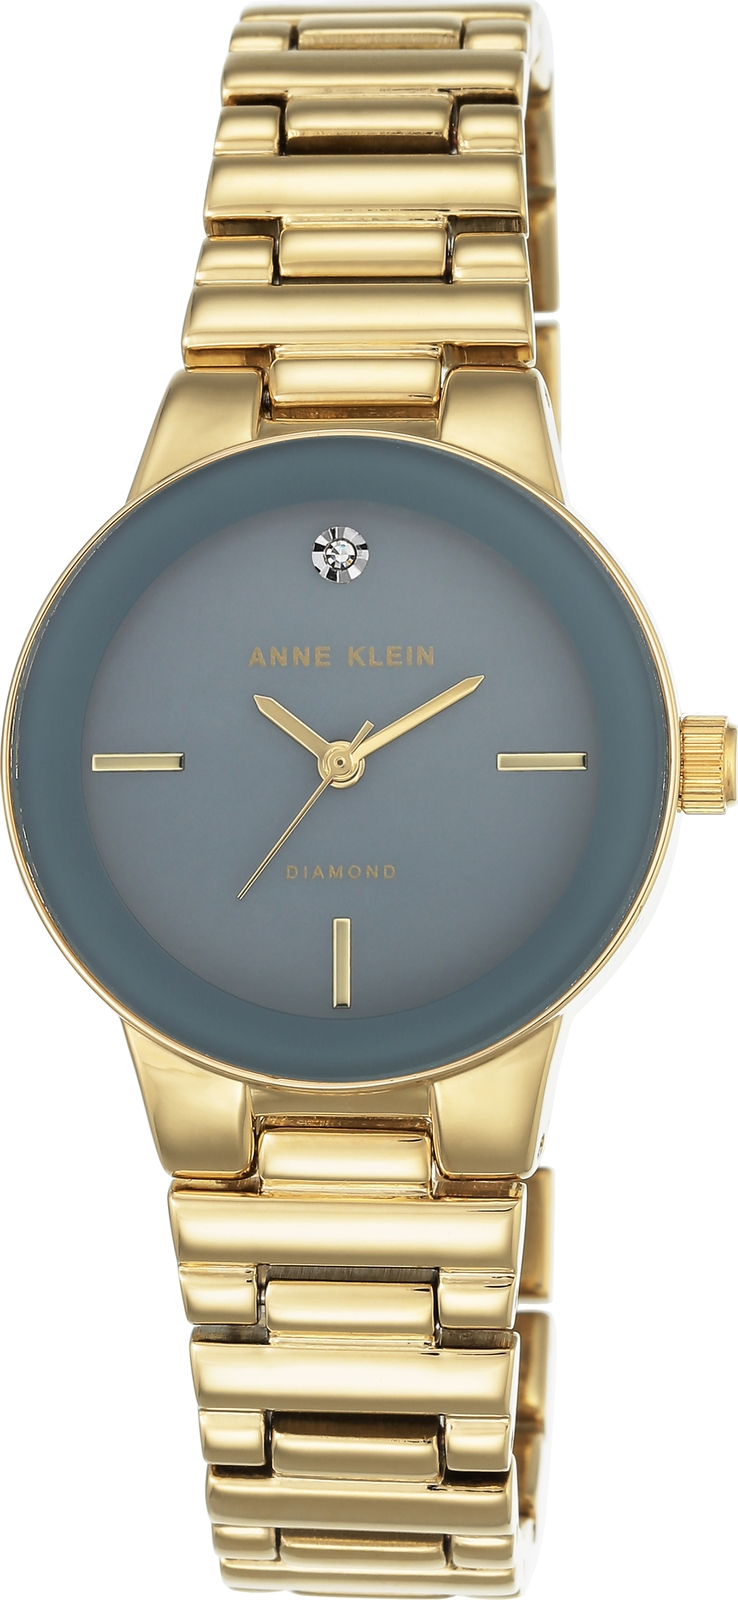 Наручные часы Anne Klein женские голубой